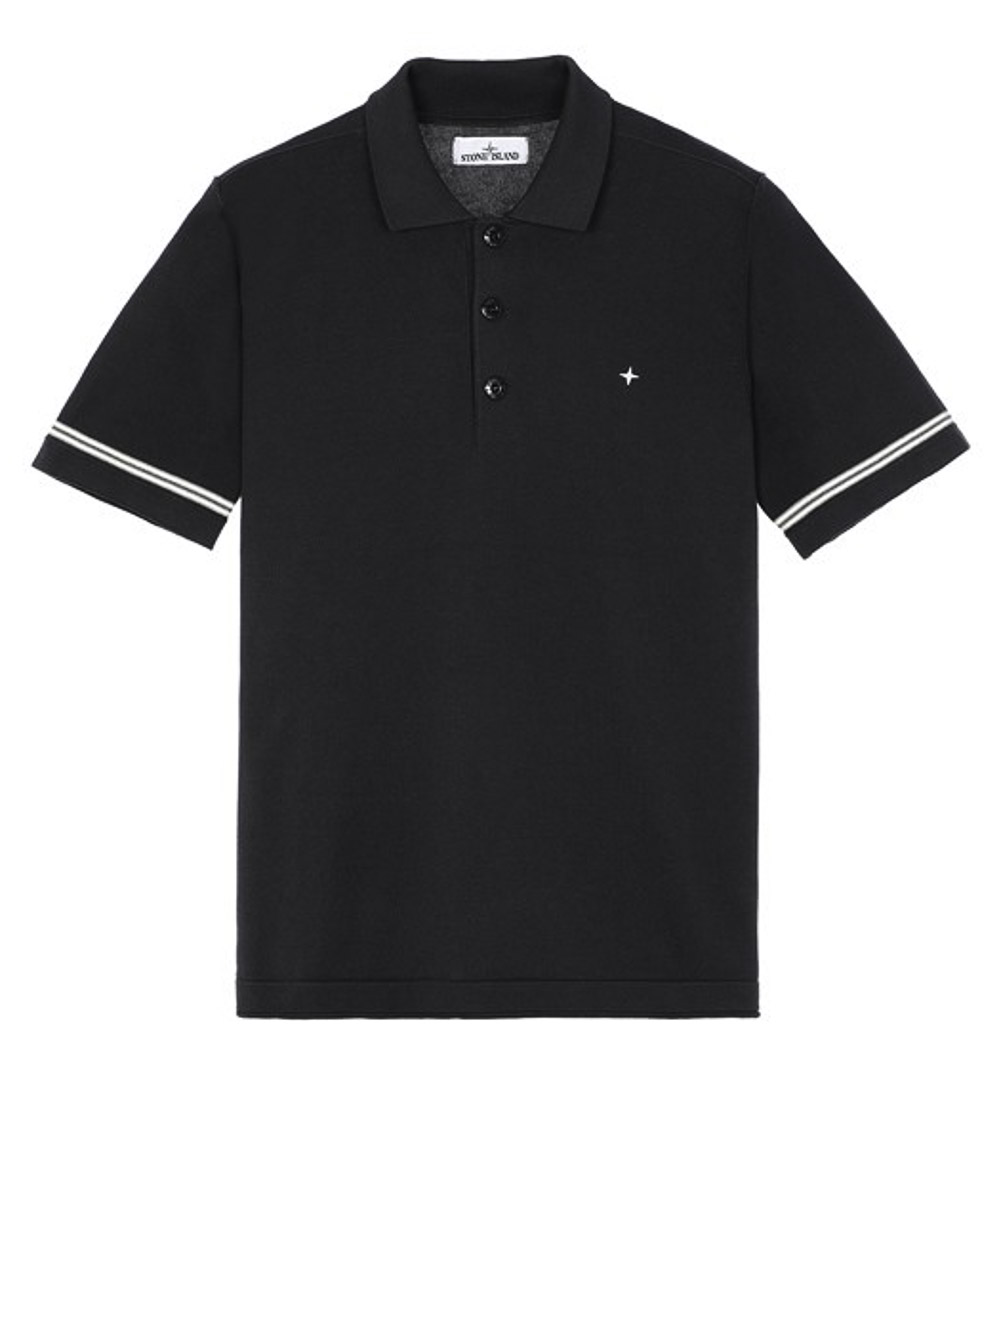 STONE ISLAND Μπλούζα polo MO741552682-V0020 ΜΠΛΕ